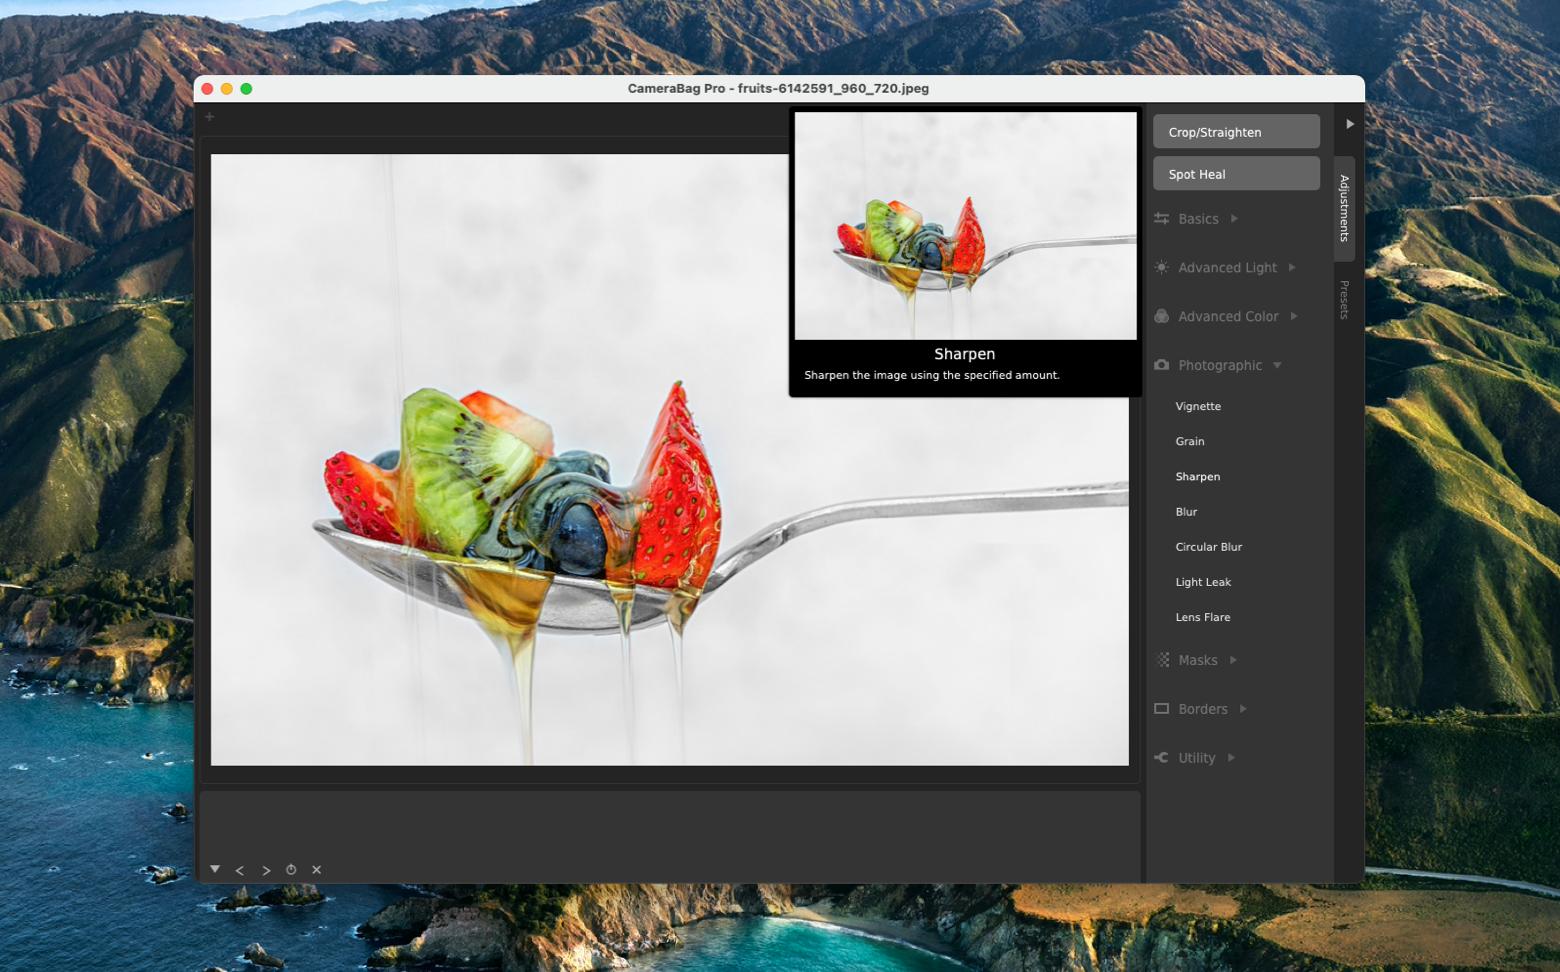 CameraBag Pro photo editing tool